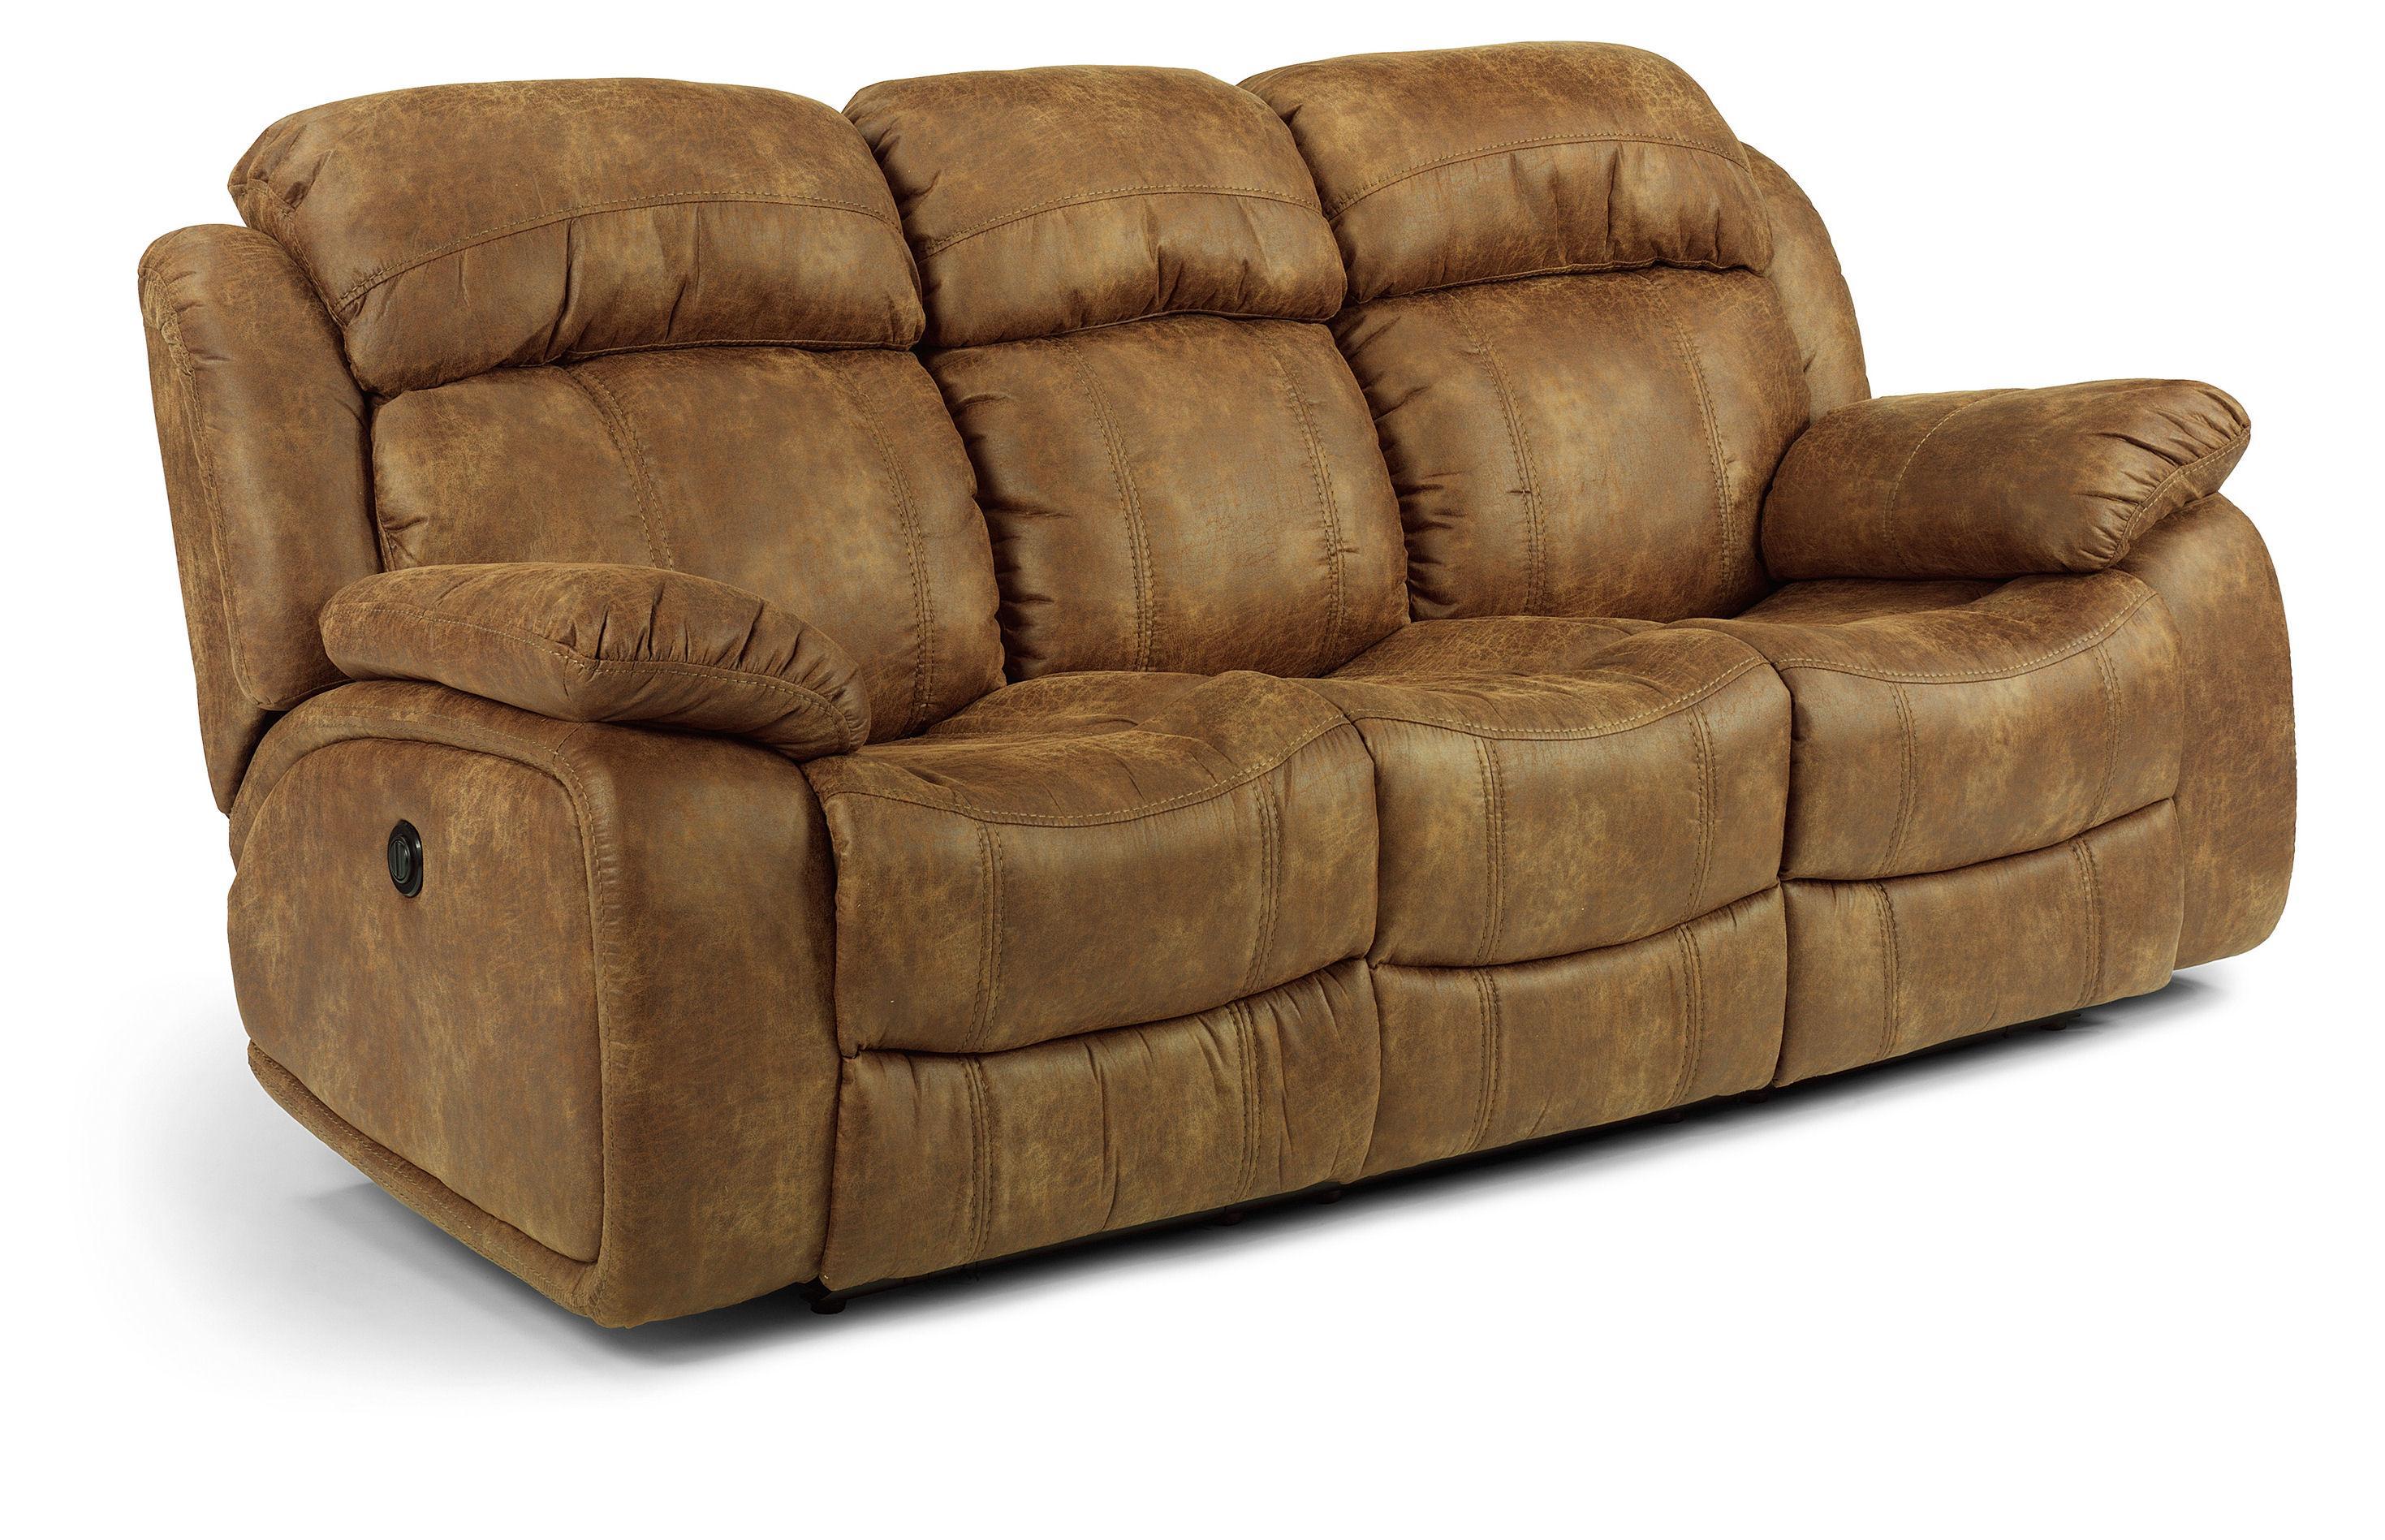 Flexsteel Latitudes Como Double Reclining Sofa